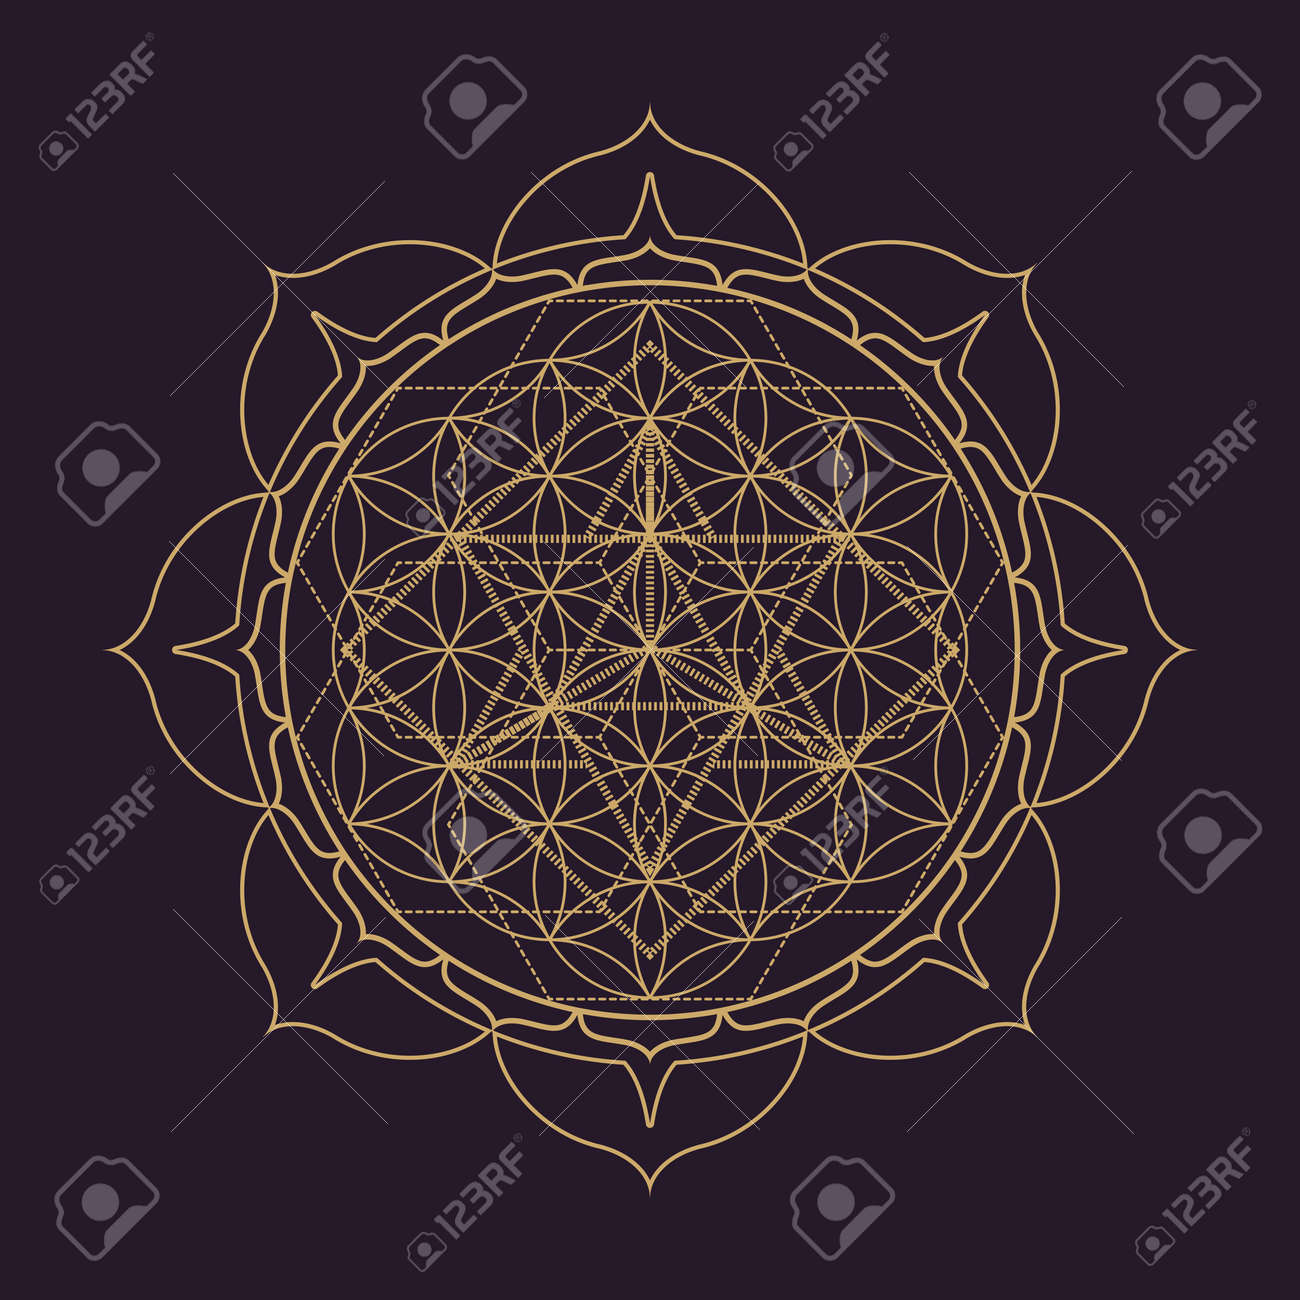 vector gold monochrome design abstract mandala sacred geometry illustration Flower of life Merkaba lotus isolated dark brown background - 67257101